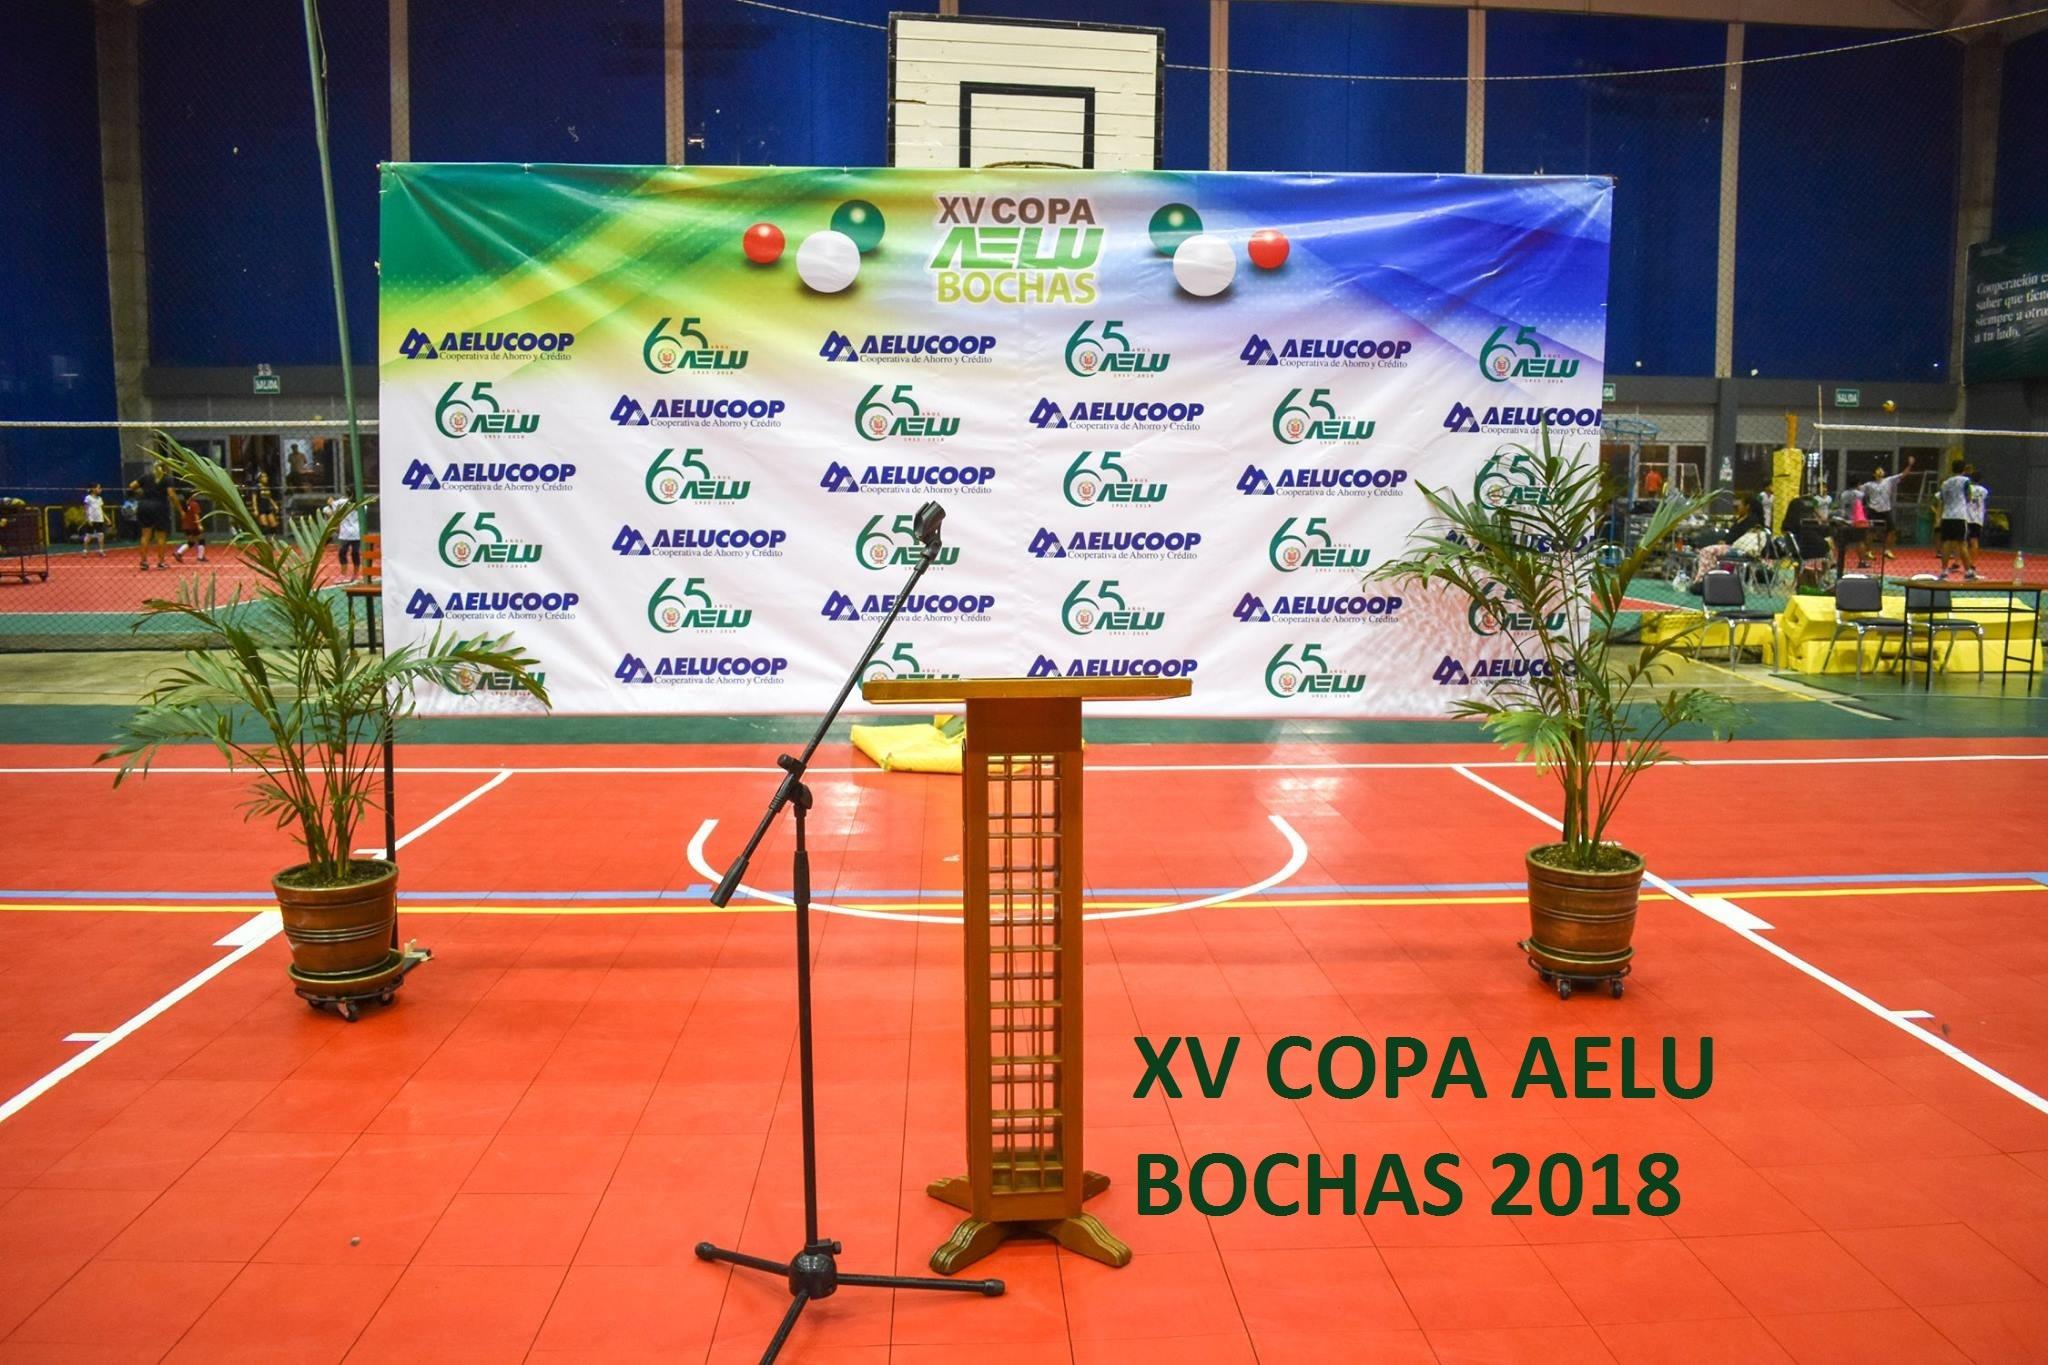 Bochas – Copa AELU XV 2018